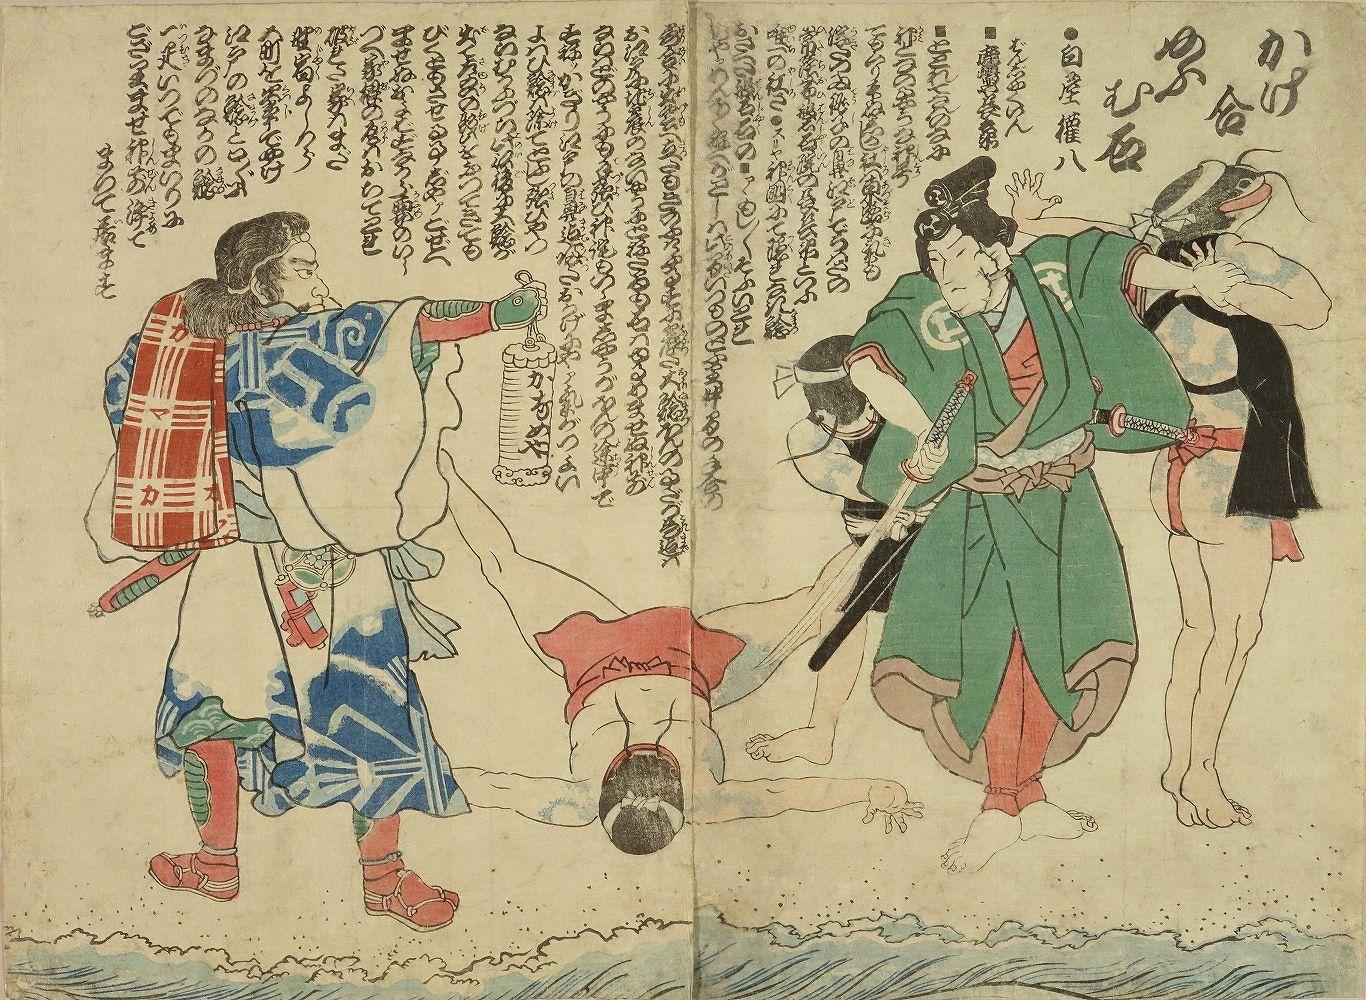 UNSIGNED <i>Namazu-e</i> (Catfish picture or earthquake picture), titled <i>Kakeai okmu ishi</i>, diptych